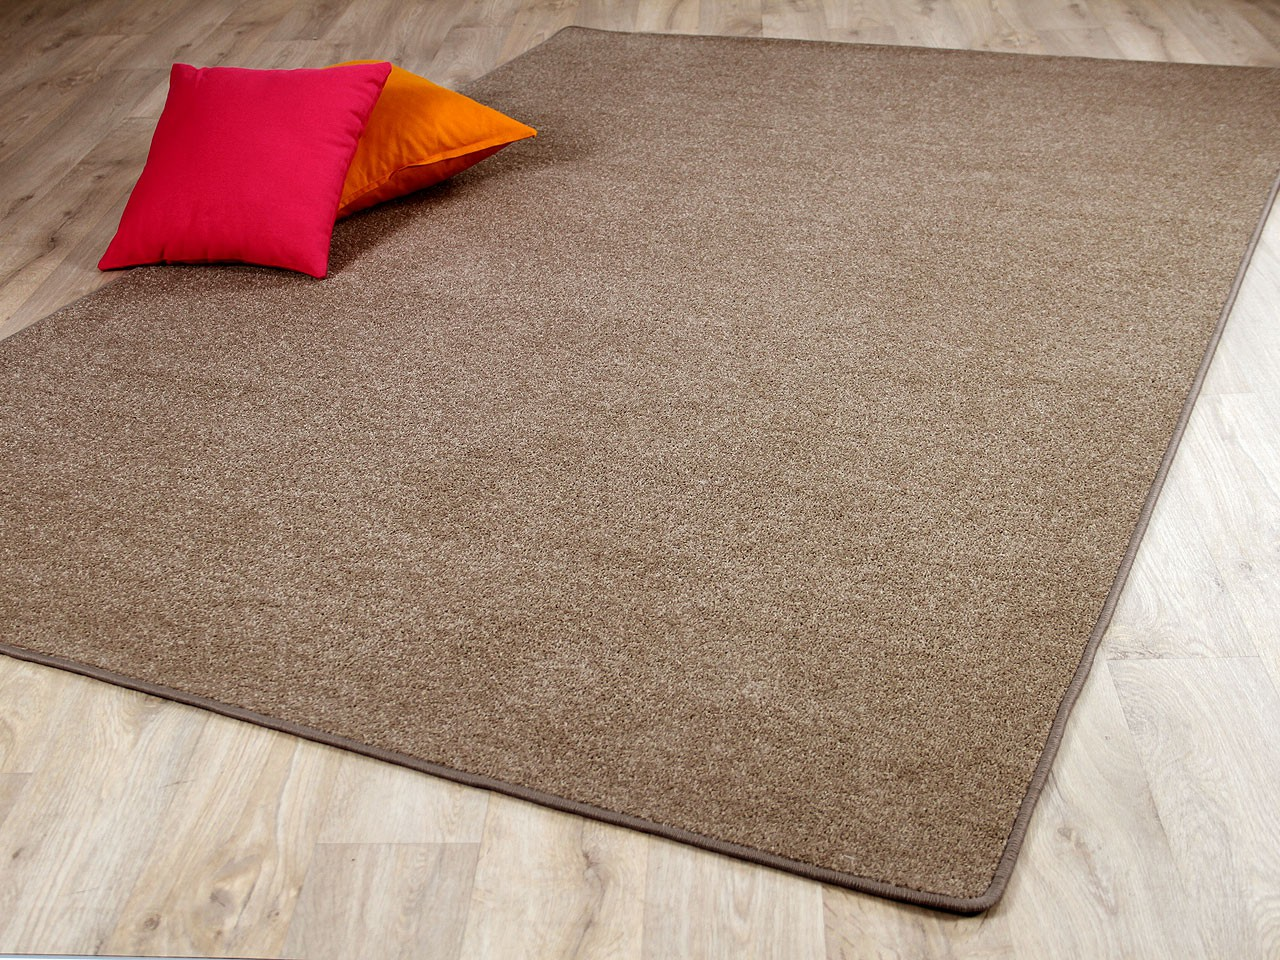 trend velours teppich joy karamell sonderaktion teppiche veloursteppiche trend velours joy. Black Bedroom Furniture Sets. Home Design Ideas